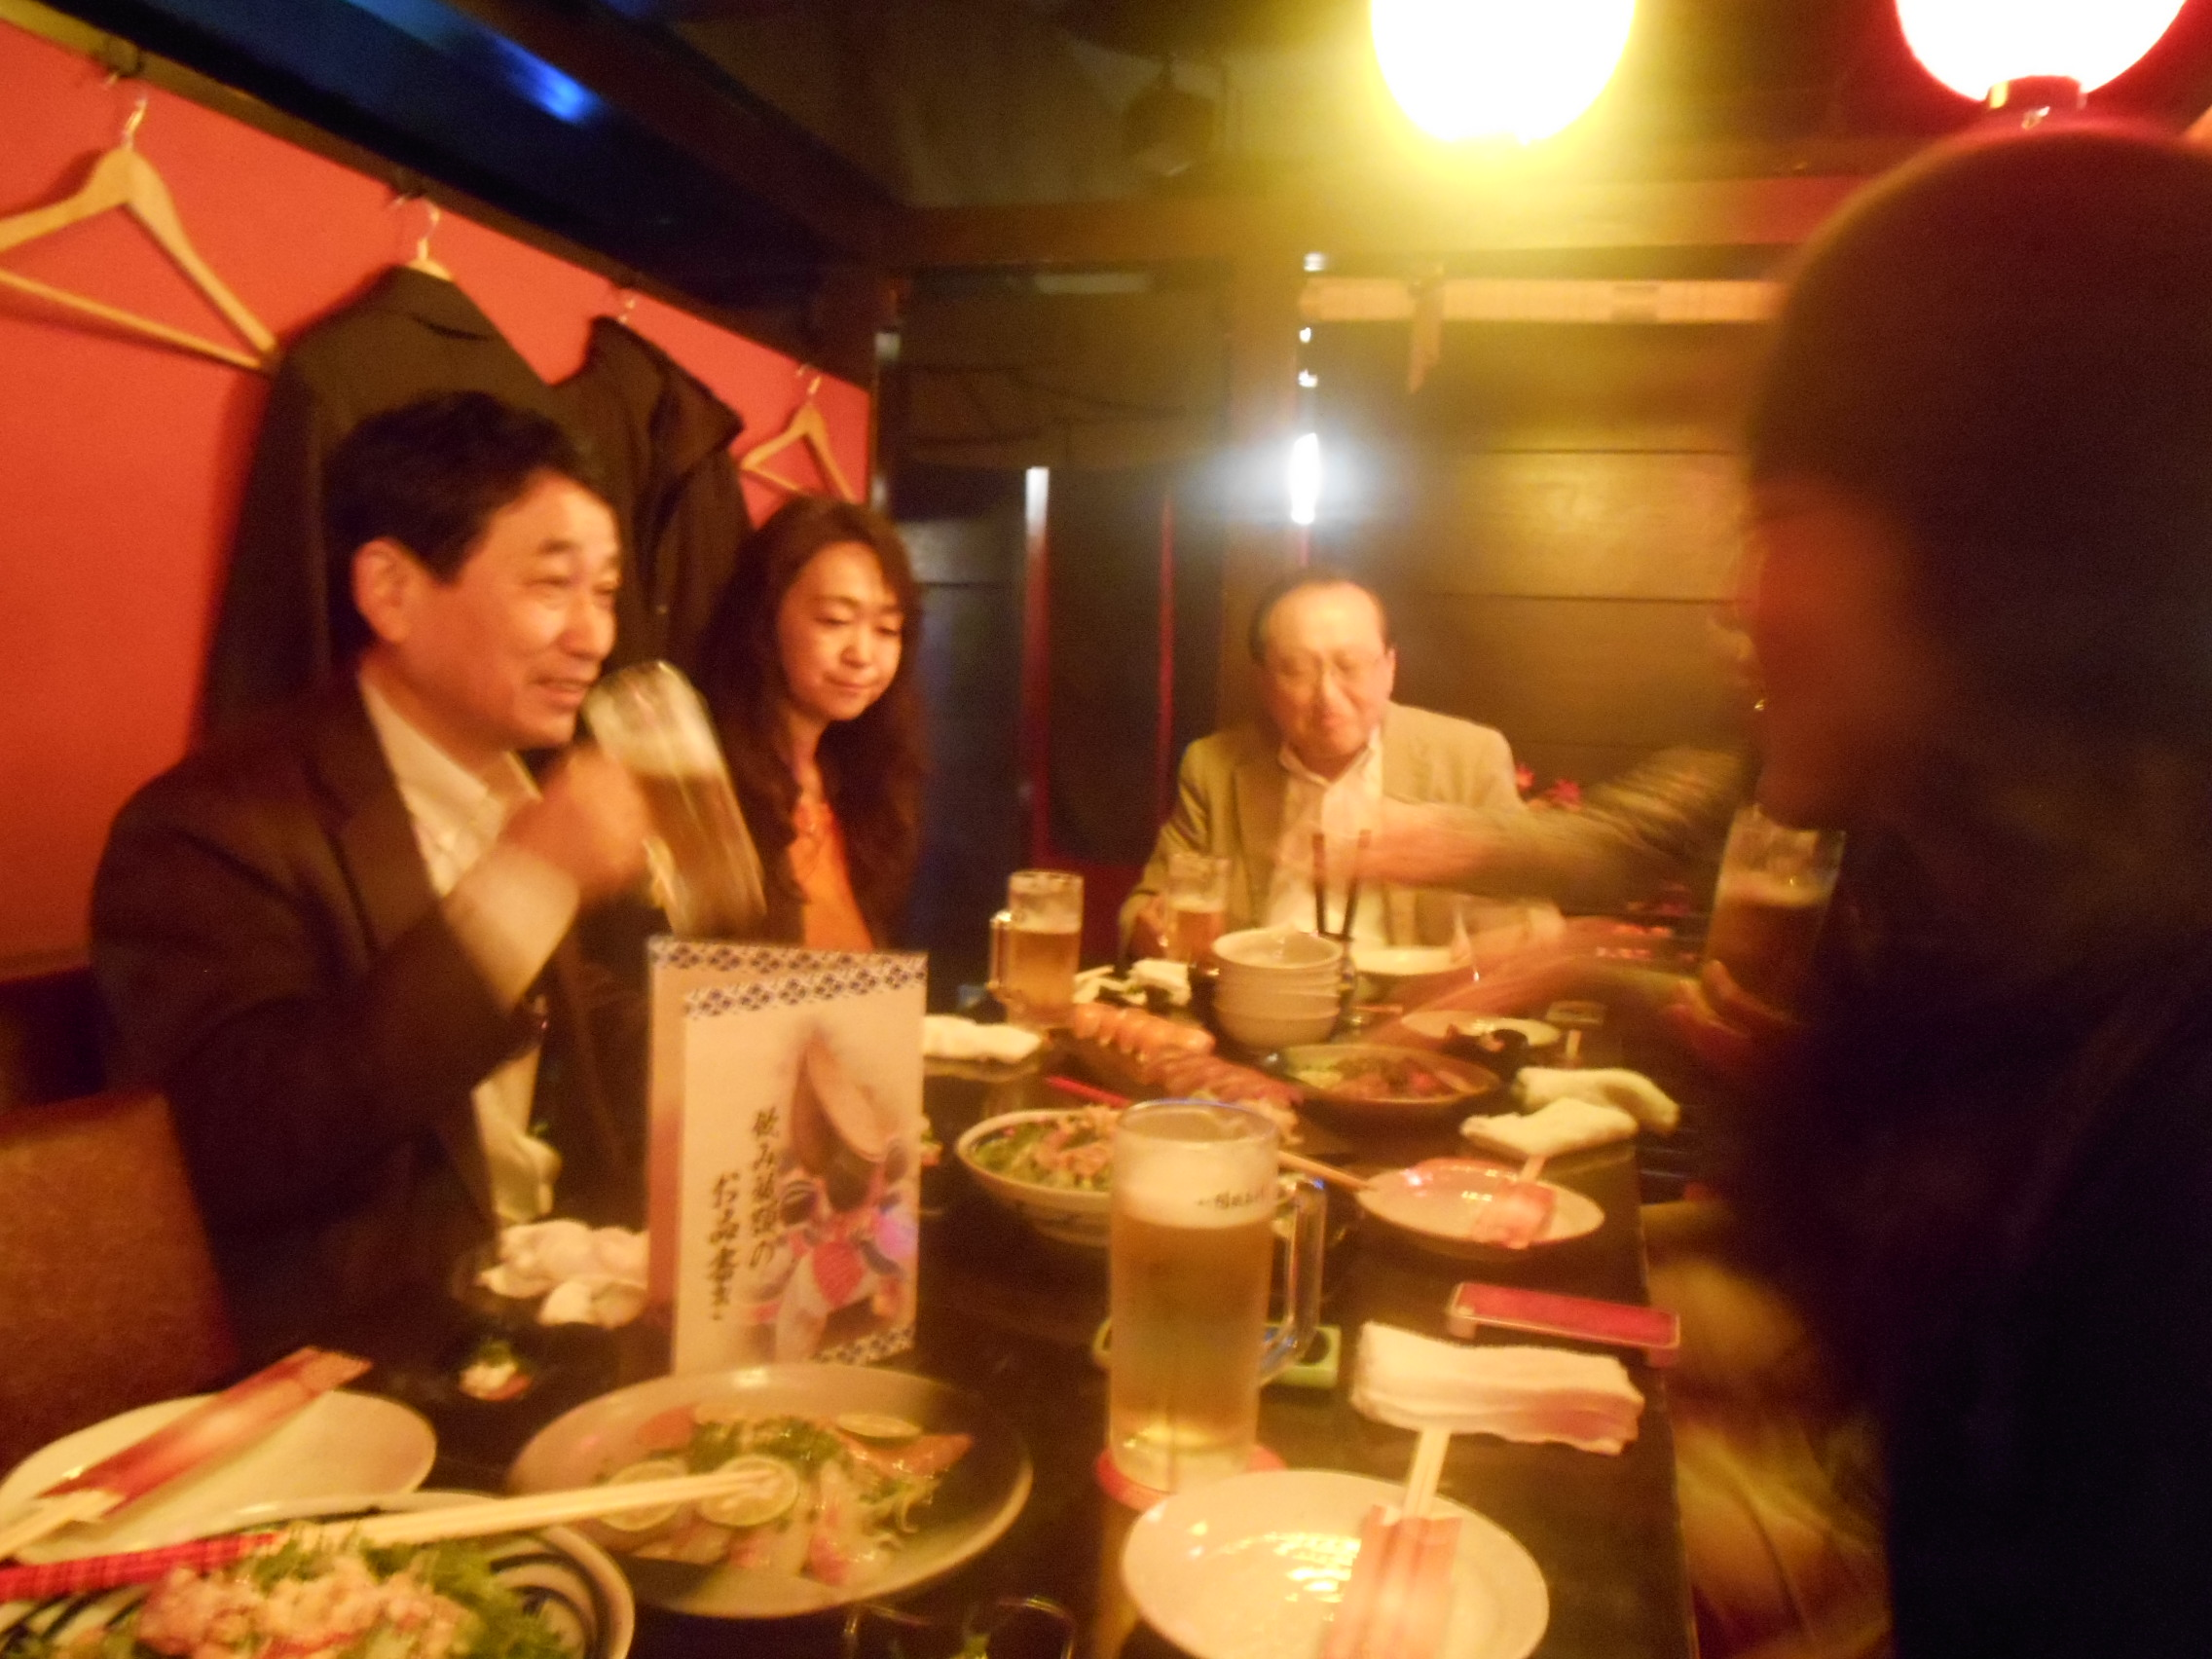 DSCN2104 - 2017年2月4日東京思風塾開催